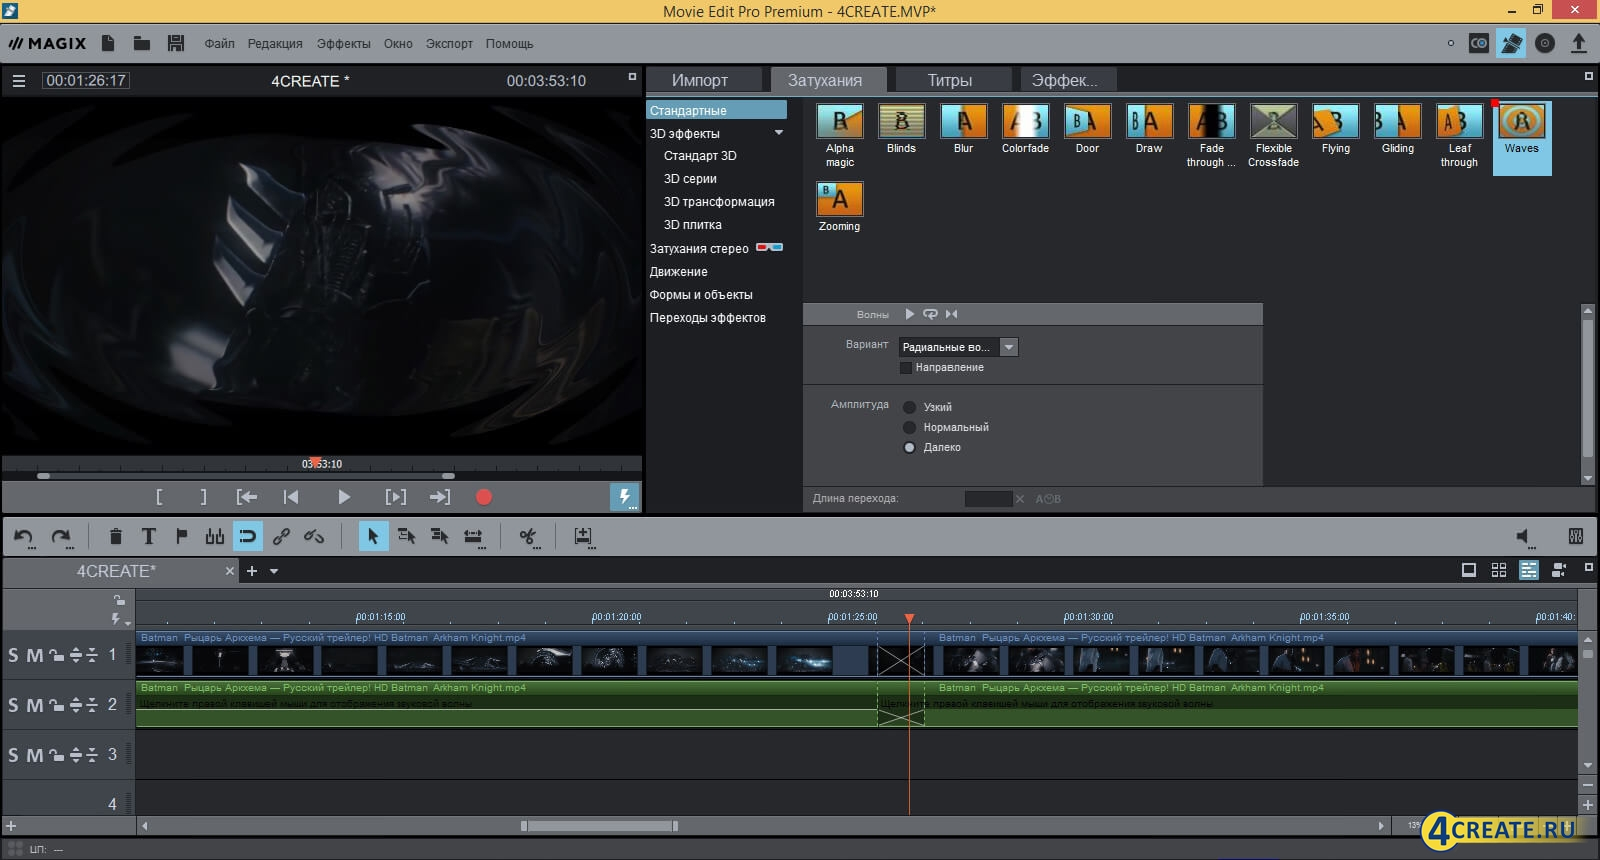 MAGIX Movie Edit Pro 2017 (Скриншот 2)